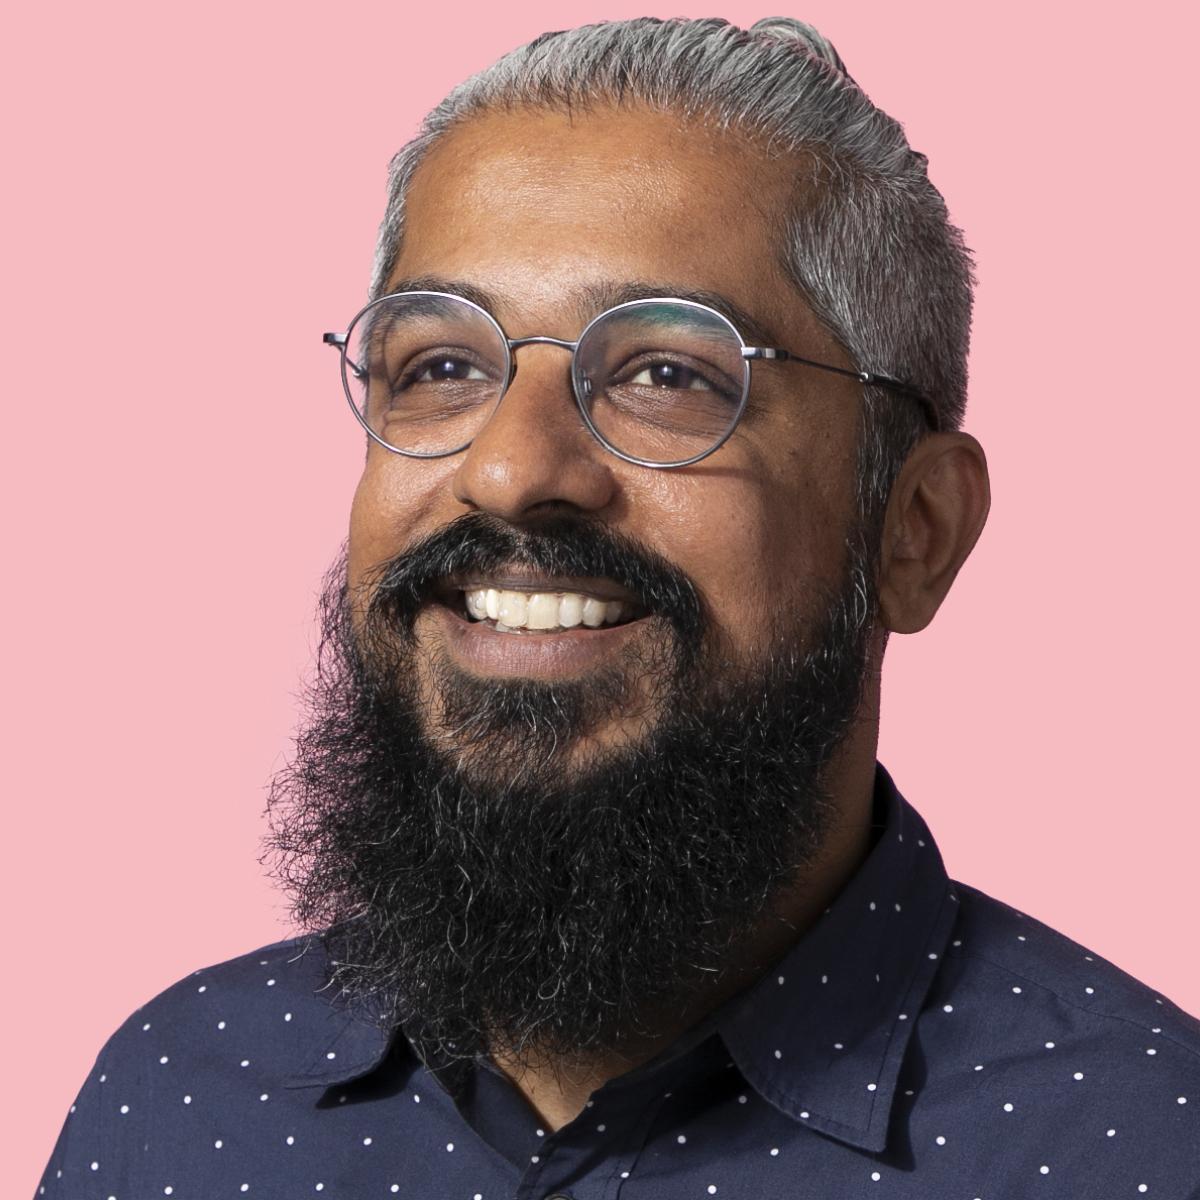 Headshot photo of Salman Suhail